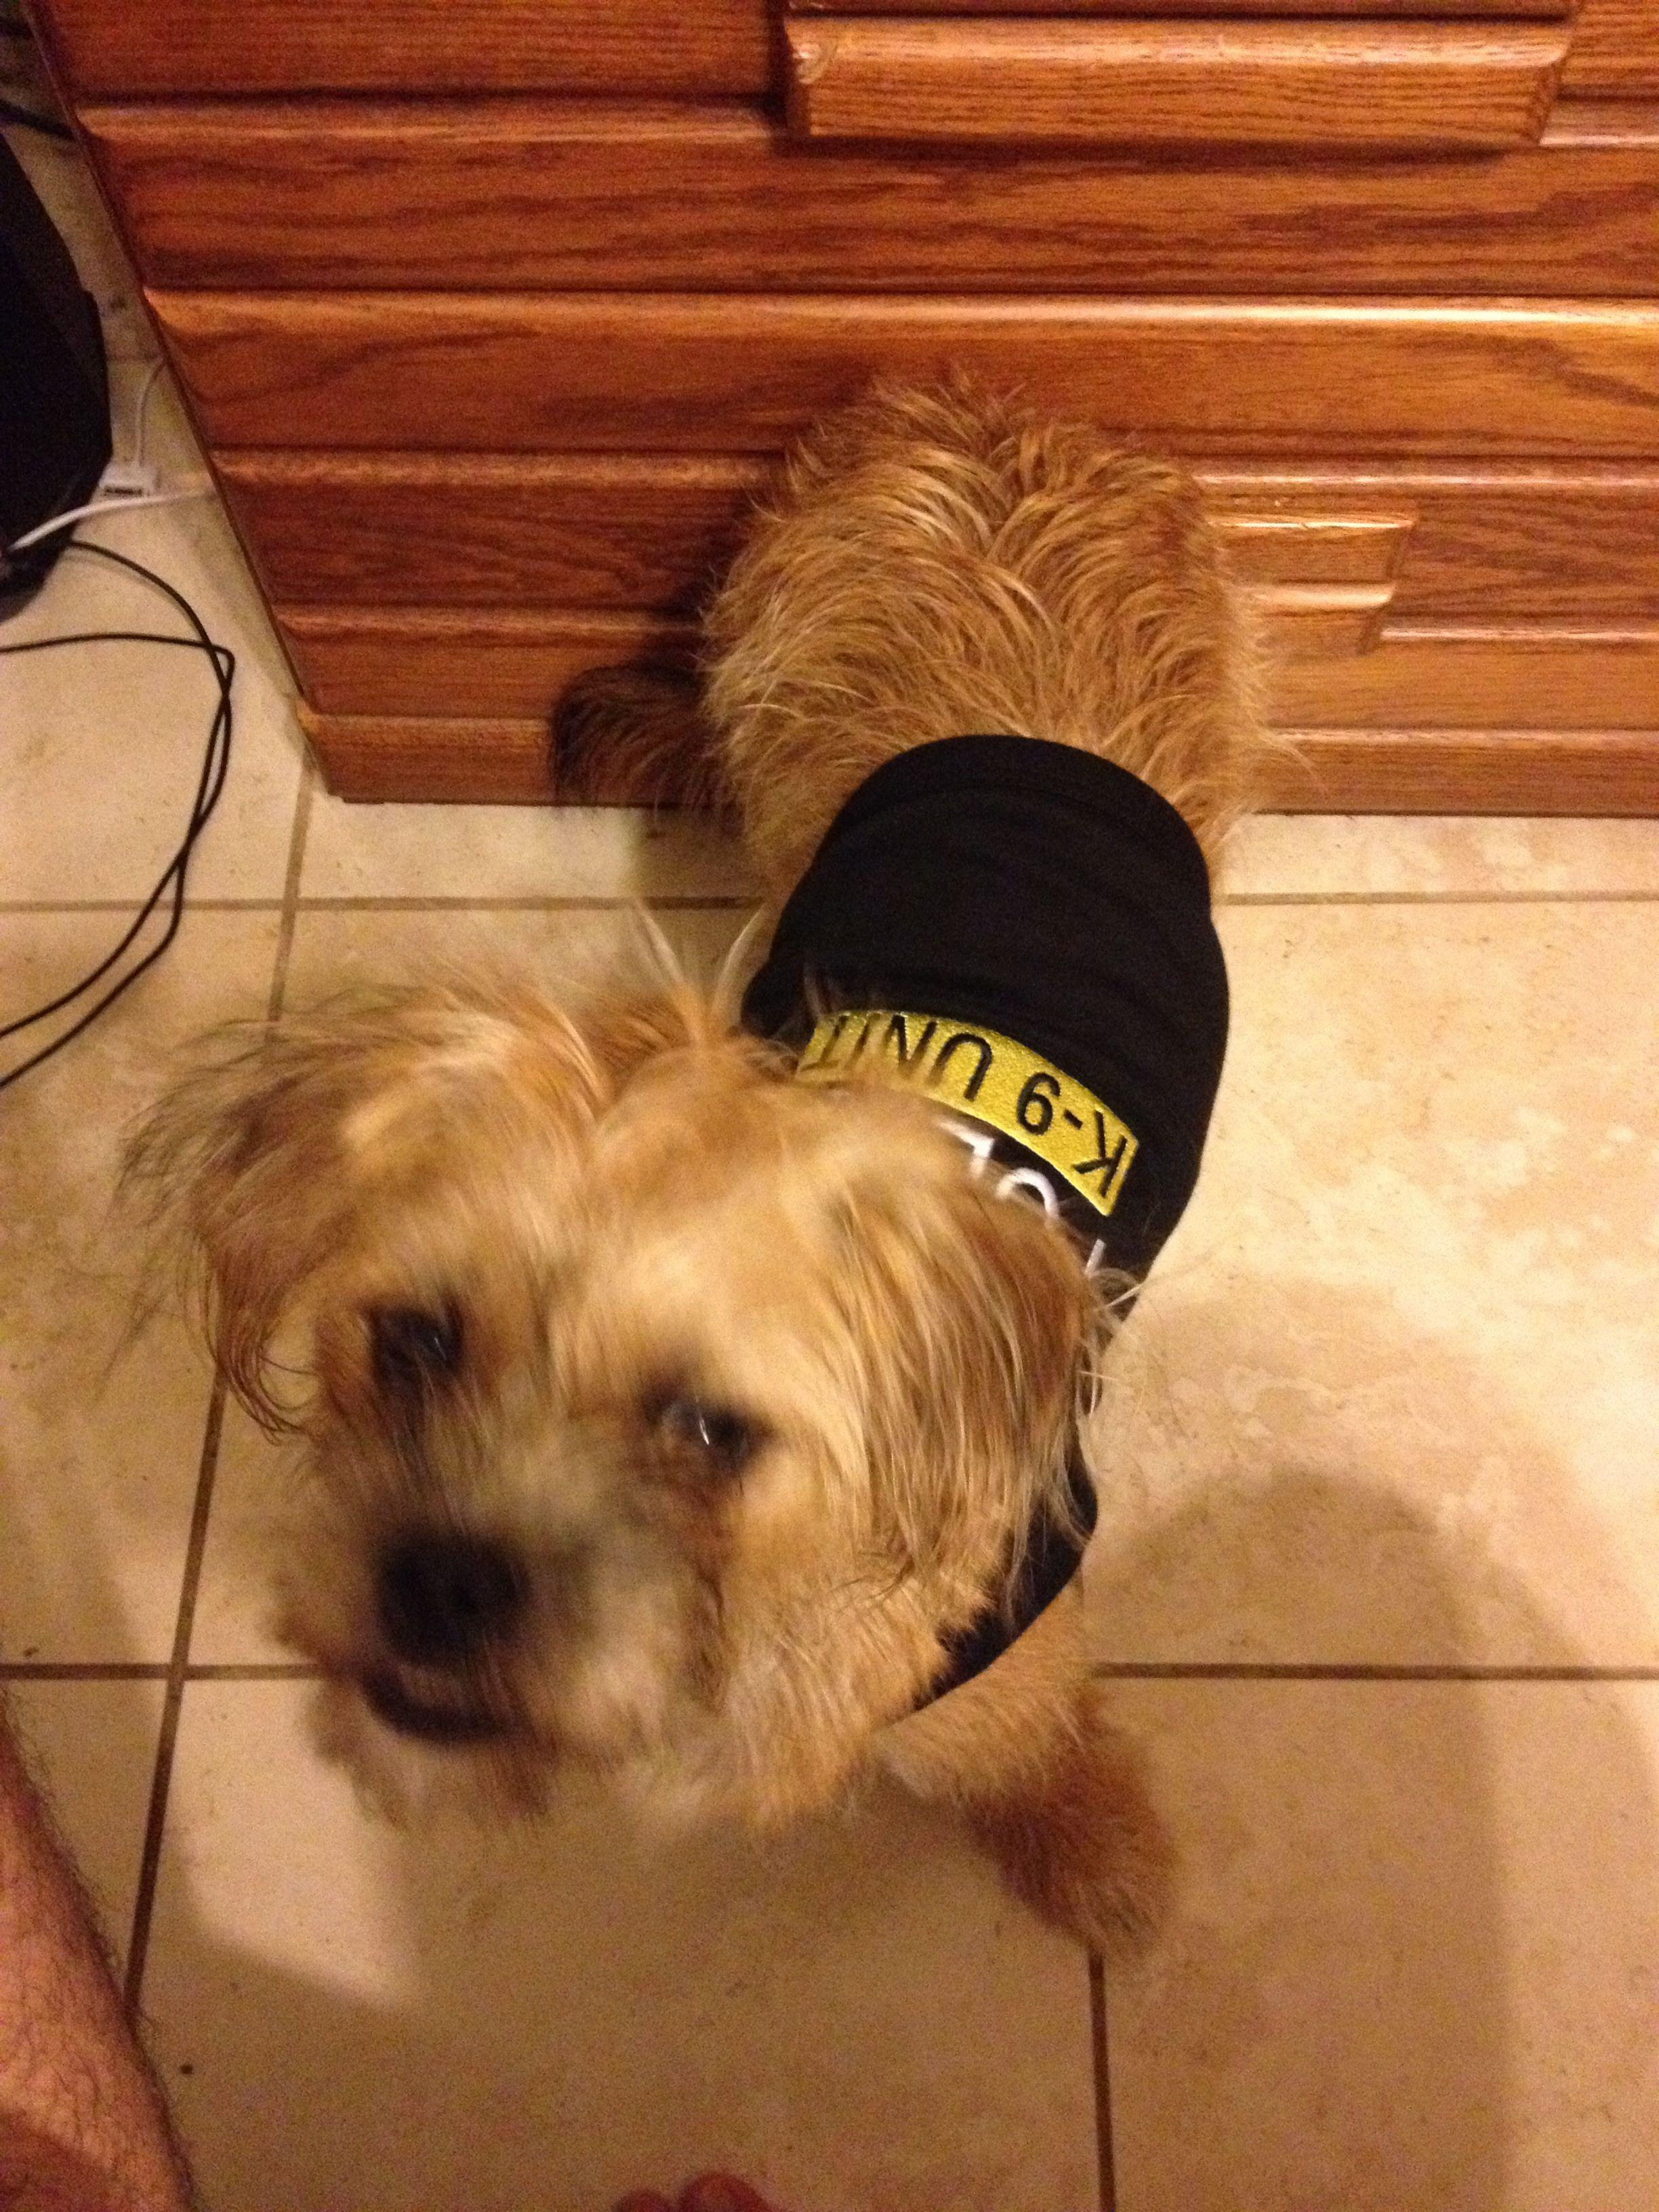 My dog thinks she's a badass so we got her a shirt she's officially a police k9 unit dog lmfao